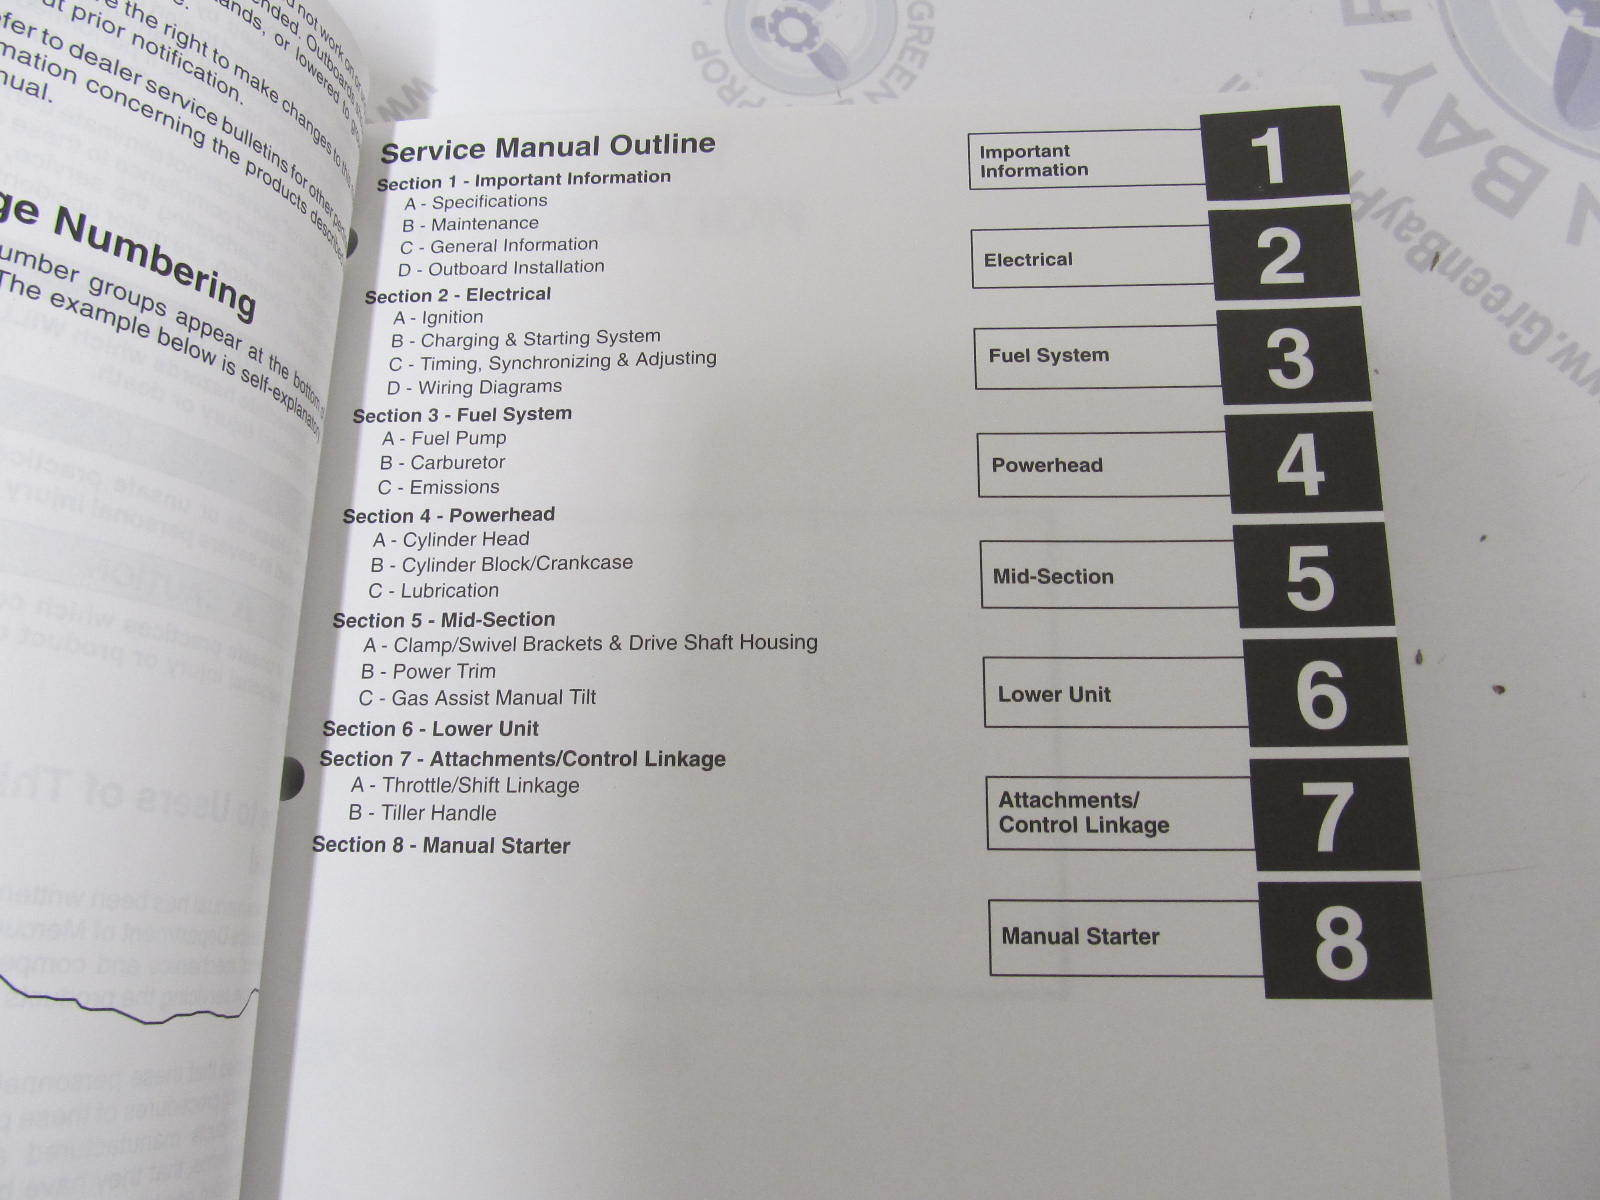 ... 90-854785R1 1998 Mercury Mariner Outboard Service Manual 25 Bigfoot  4-Stroke